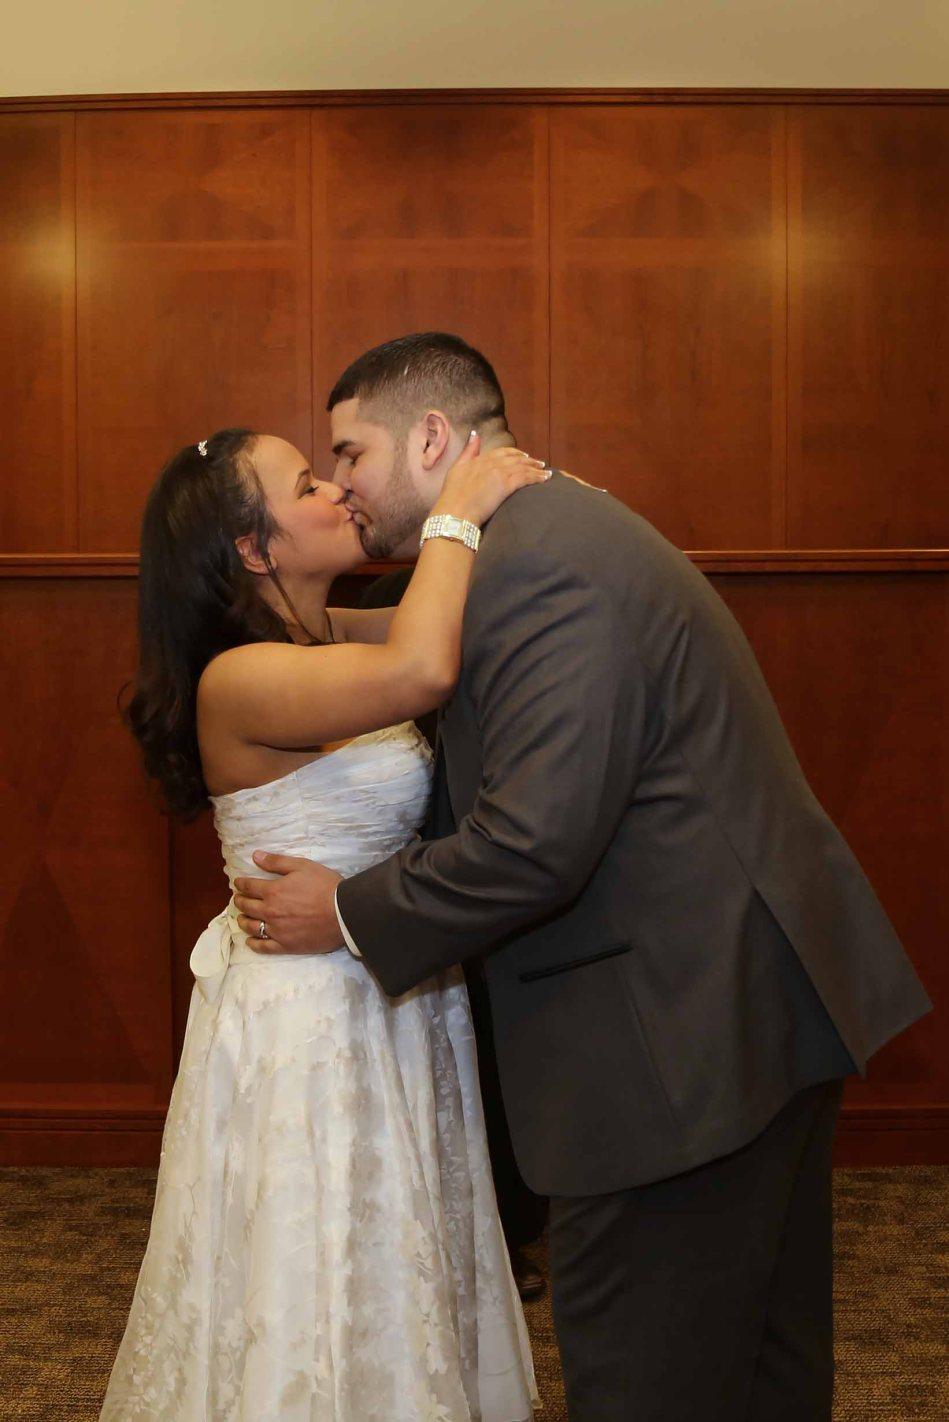 civil wedding ceremony-first kiss-bride and groom-perth amboy municipal court